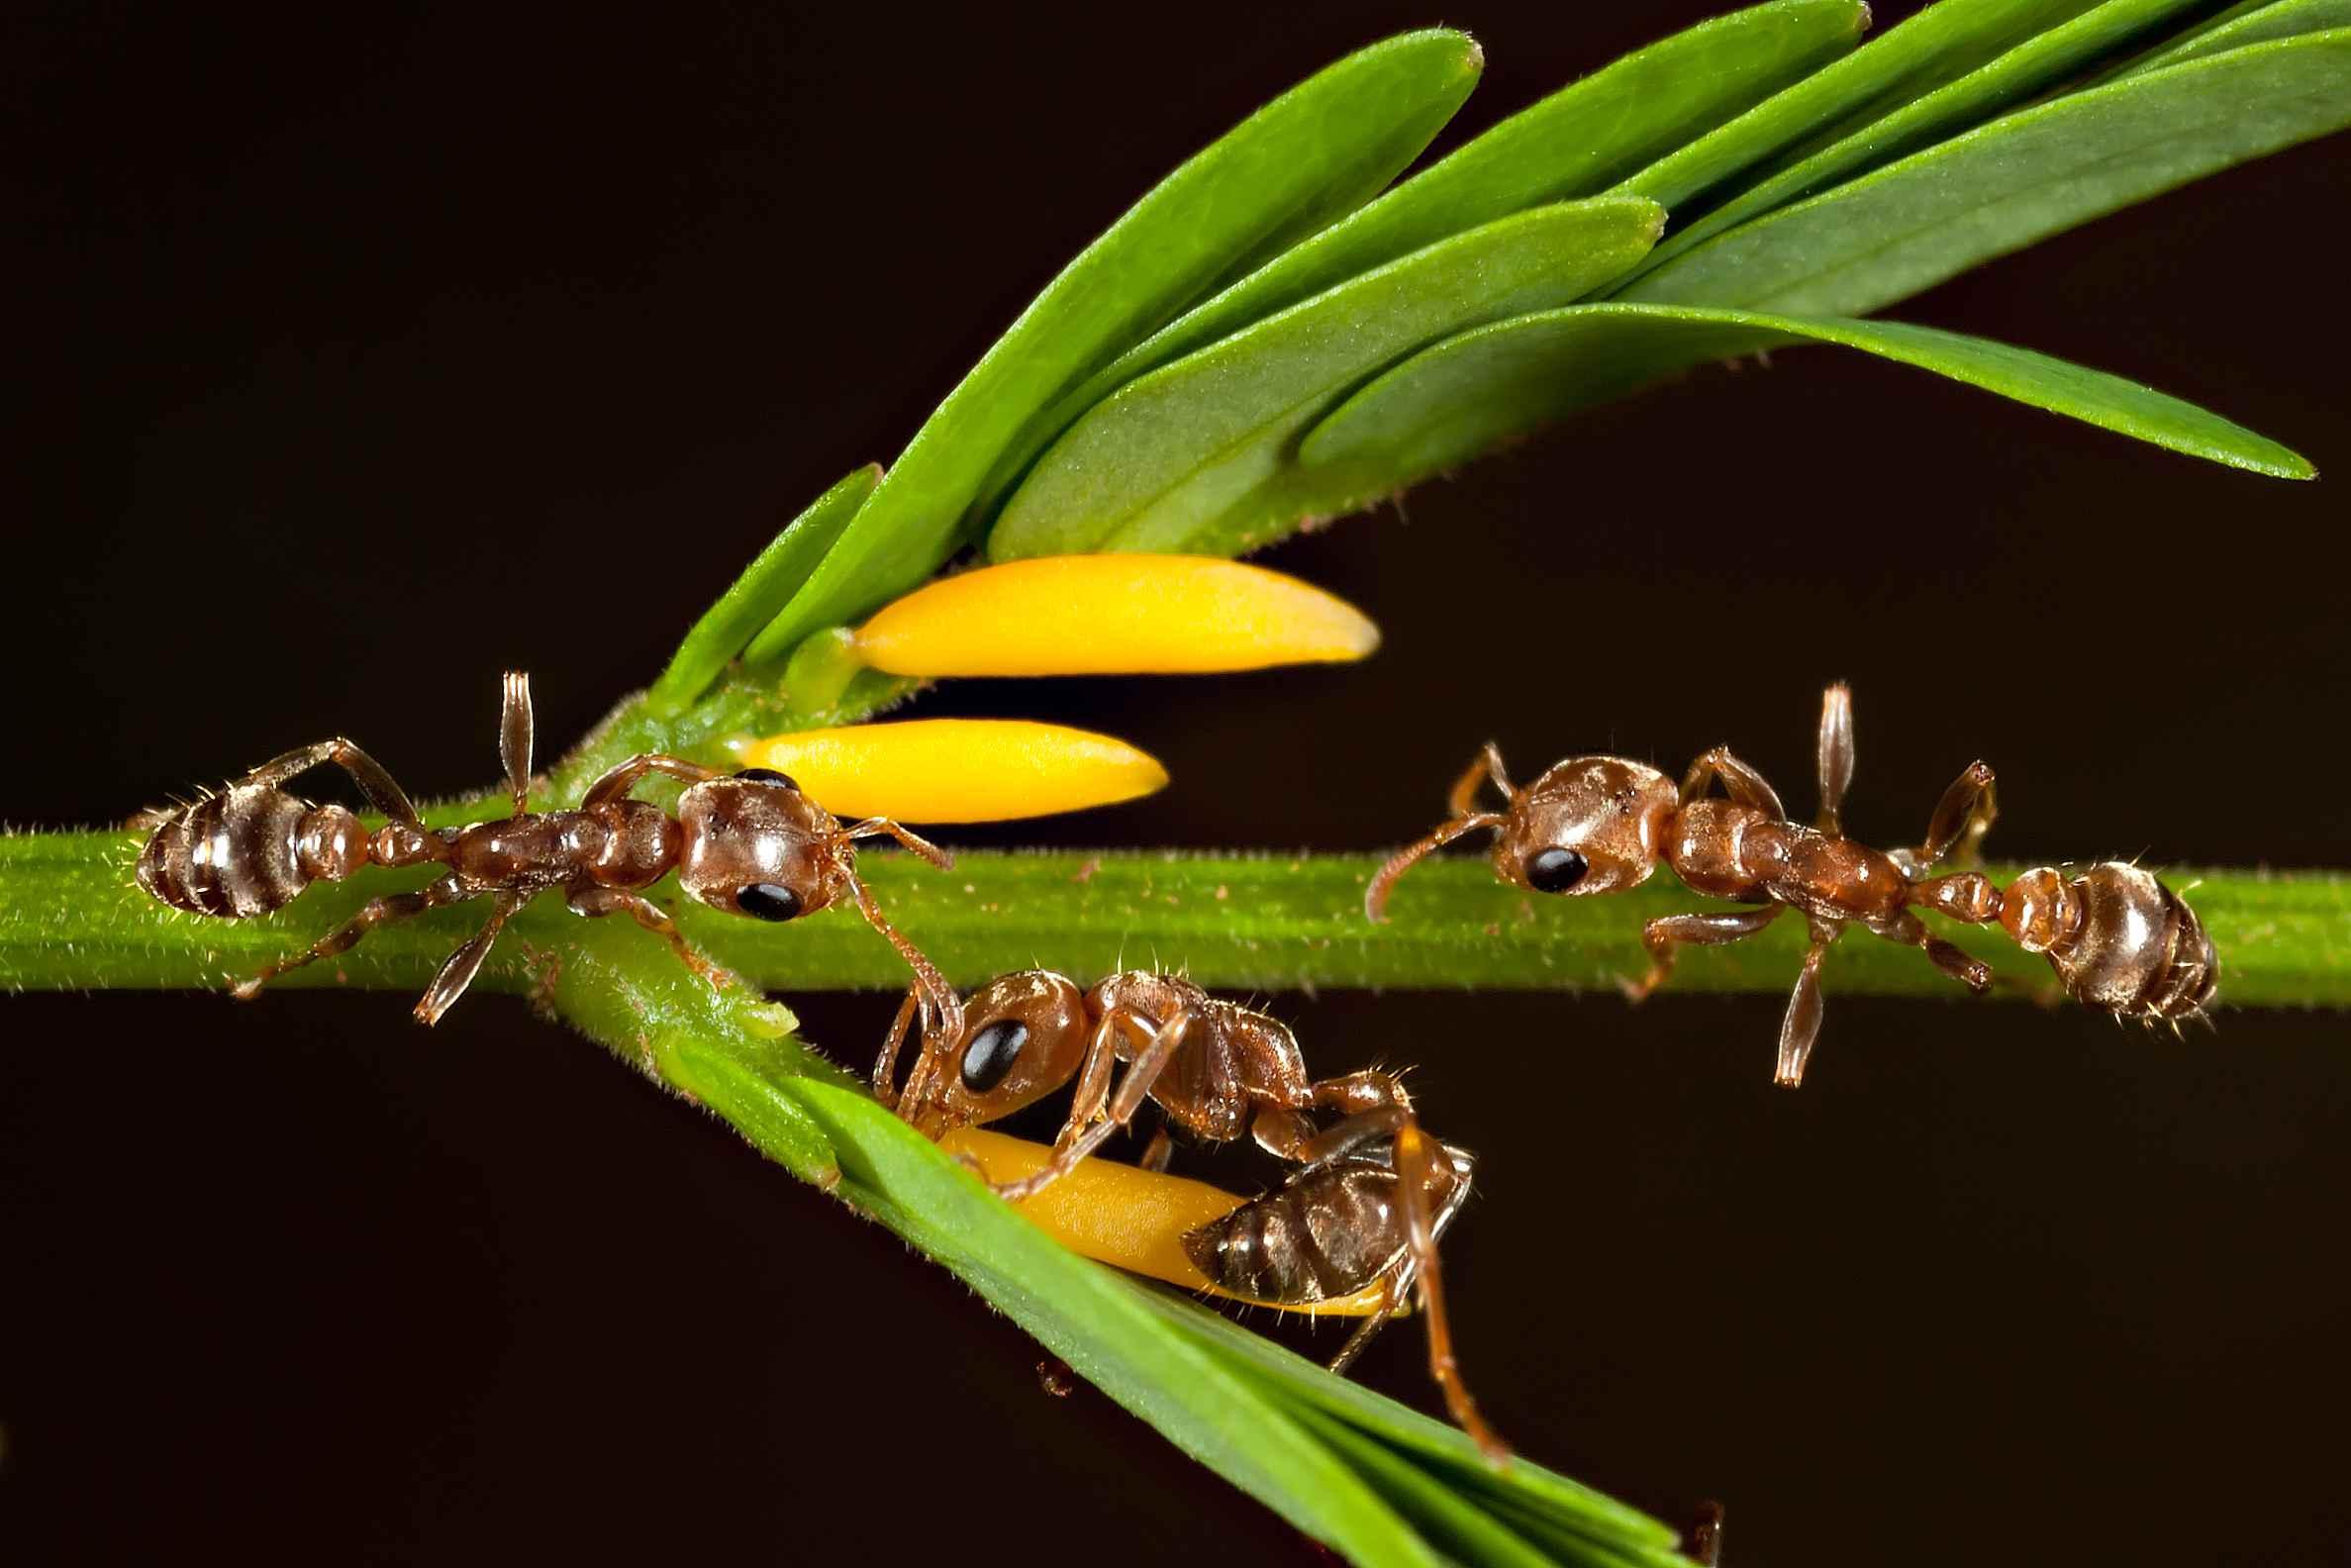 acacia ant